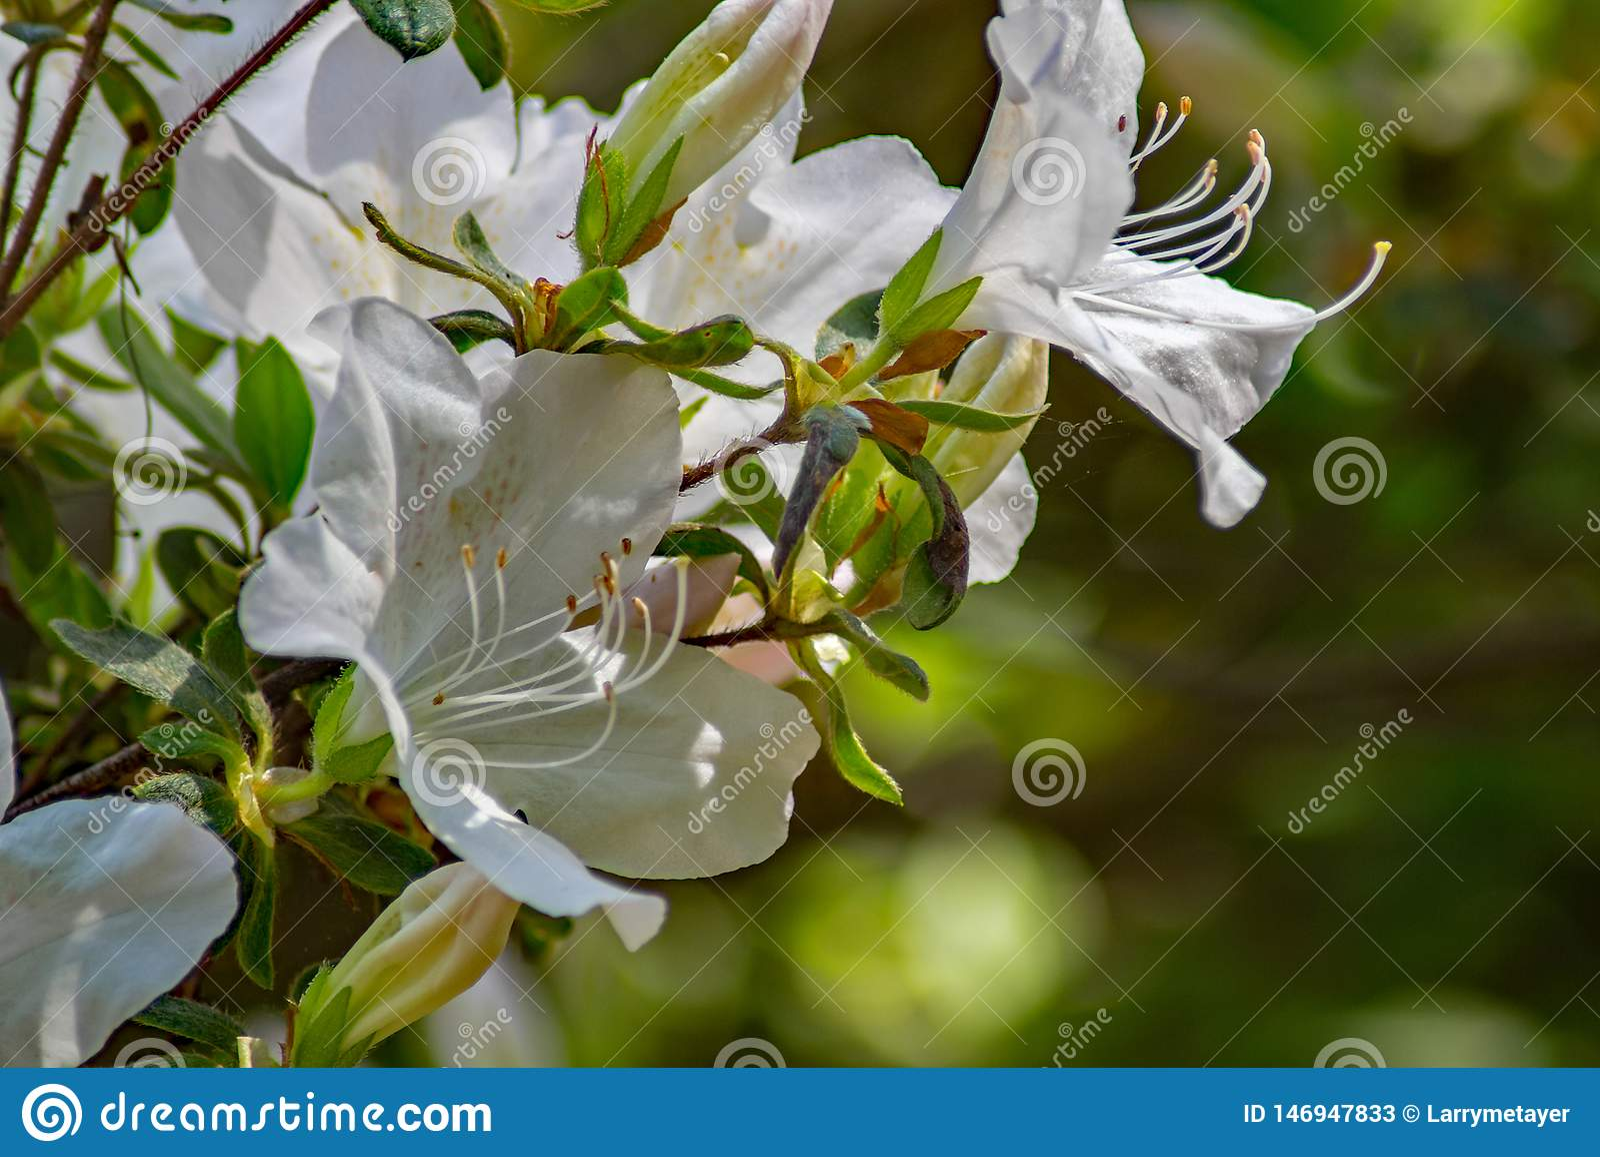 Closeup of Wild White Azalea Flowers